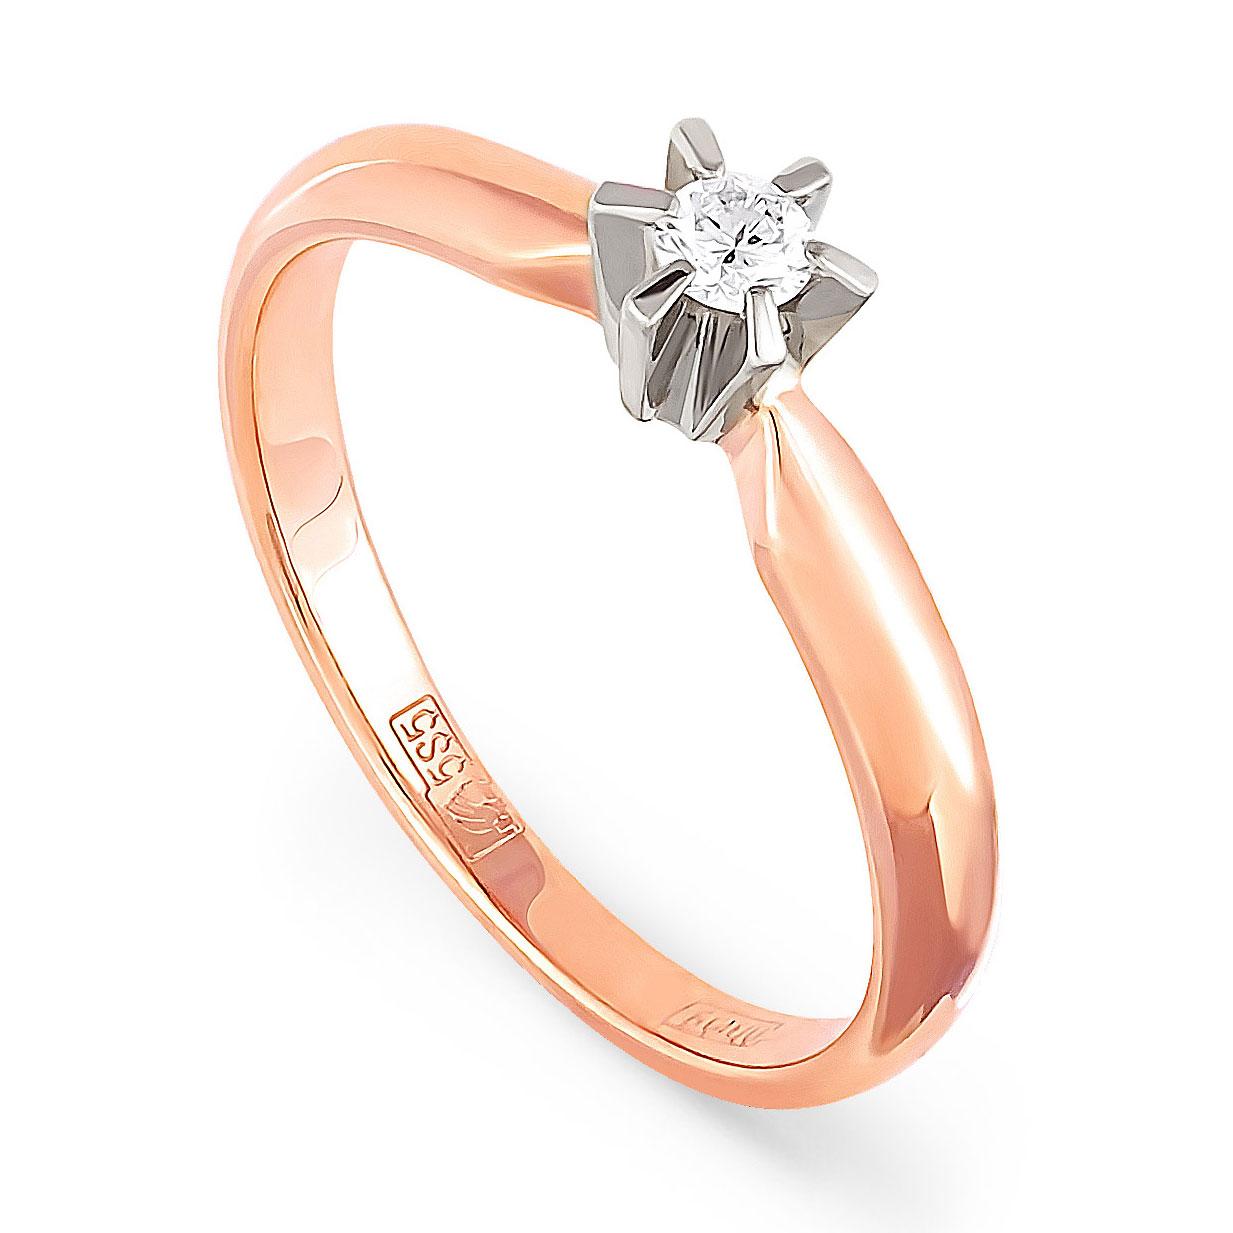 Золотое кольцо Бриллиант арт. 1-0026-1000 1-0026-1000